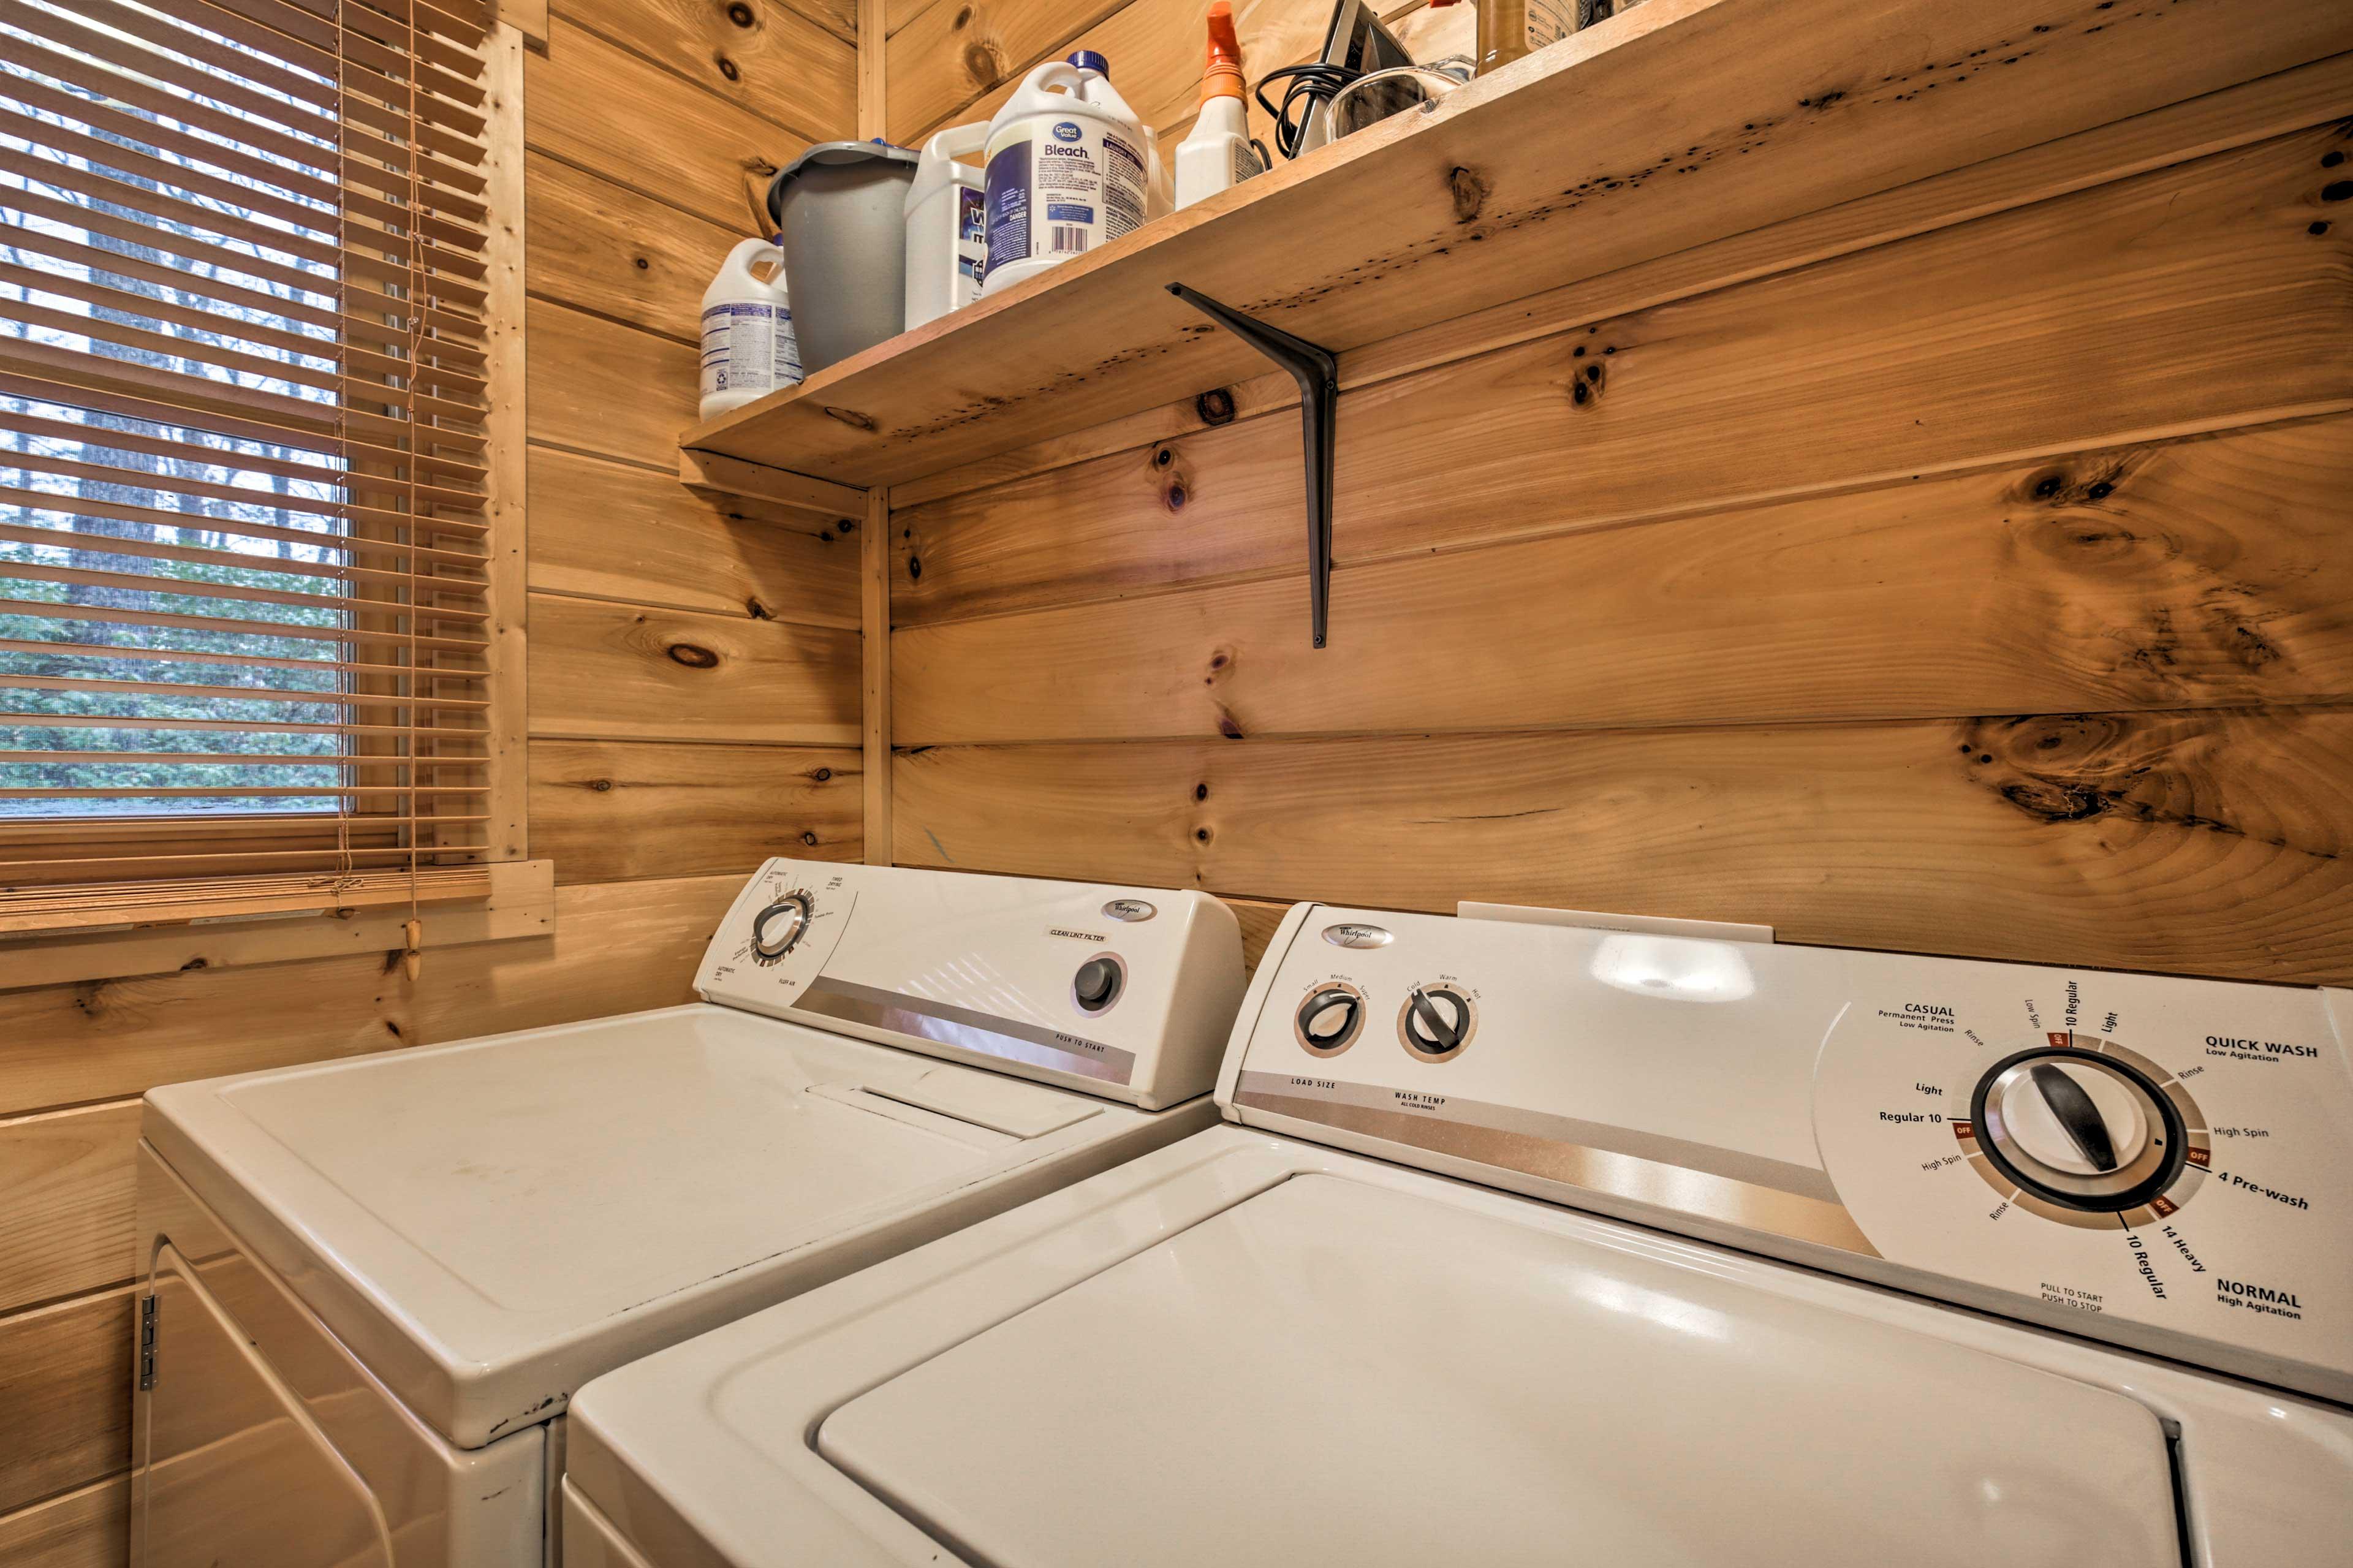 Laundry Room | Full-Sized Washer/Dryer